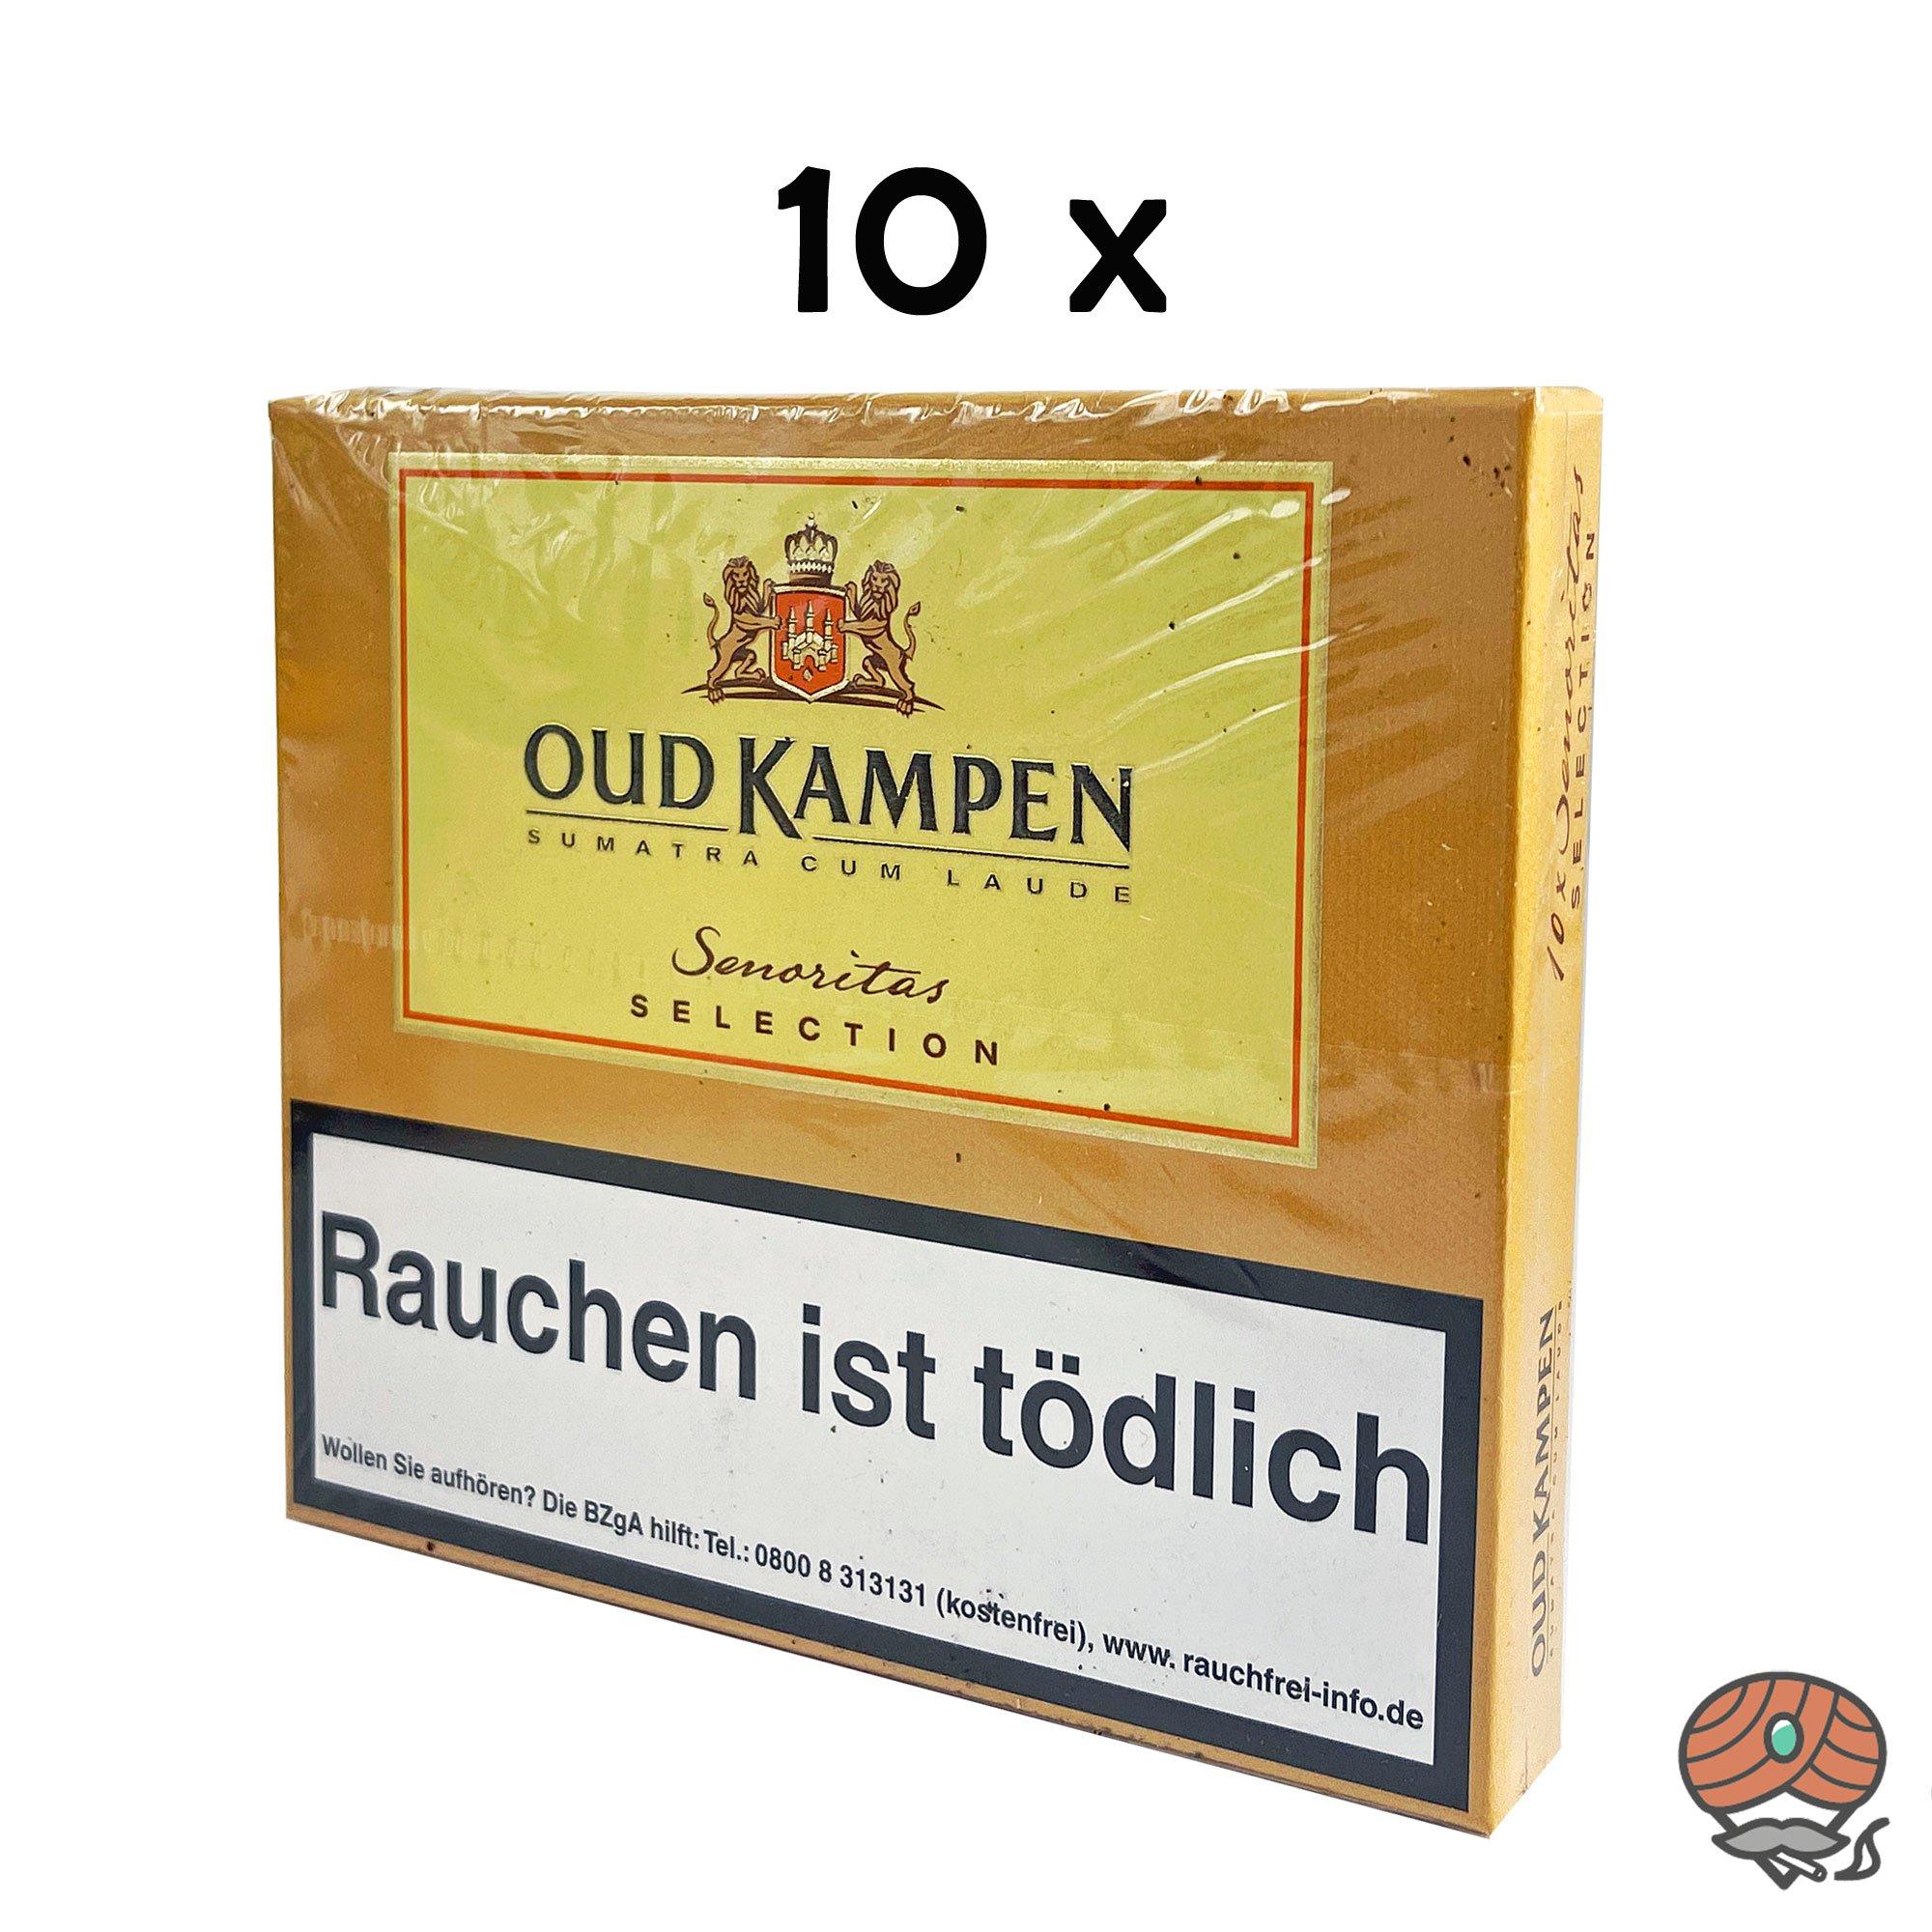 10x Oud Kampen Senoritas Selection Zigarillos 100% Tabak